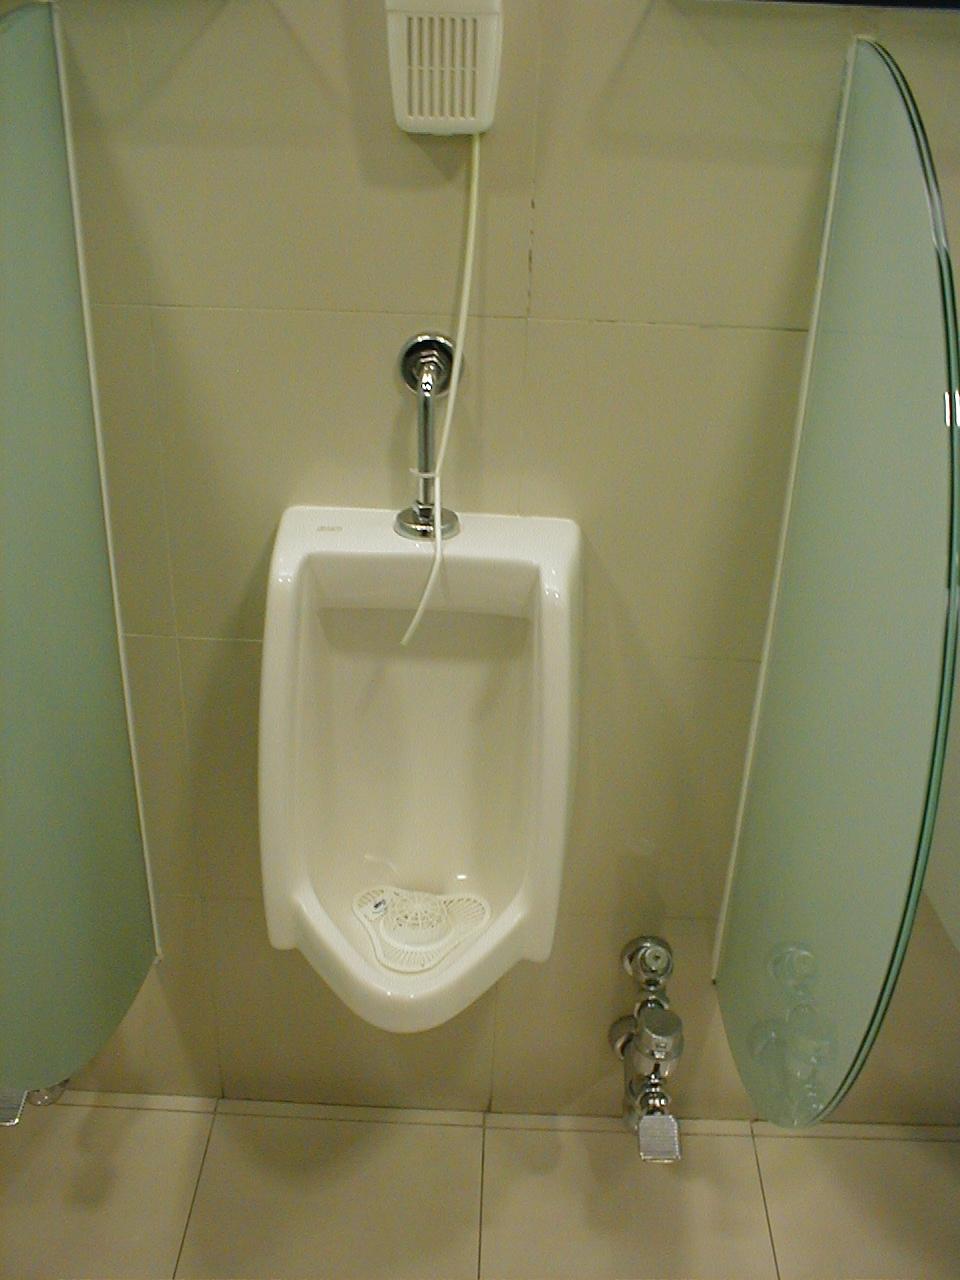 dario toilet urinal